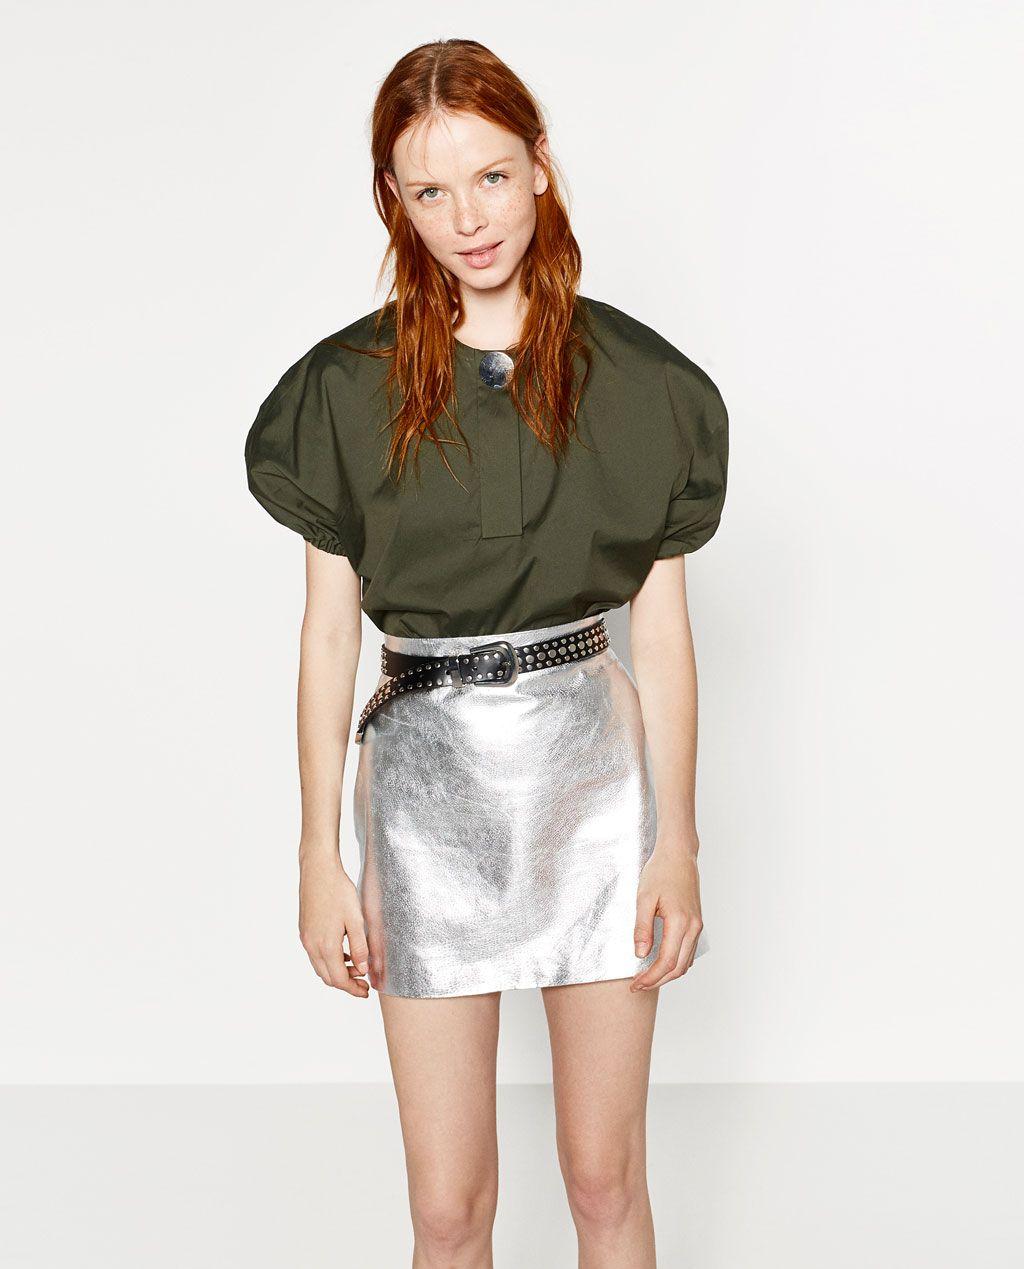 53488cfd0b2234 Image 2 of METALLIC LEATHER SKIRT from Zara | women's wear | Jupe ...